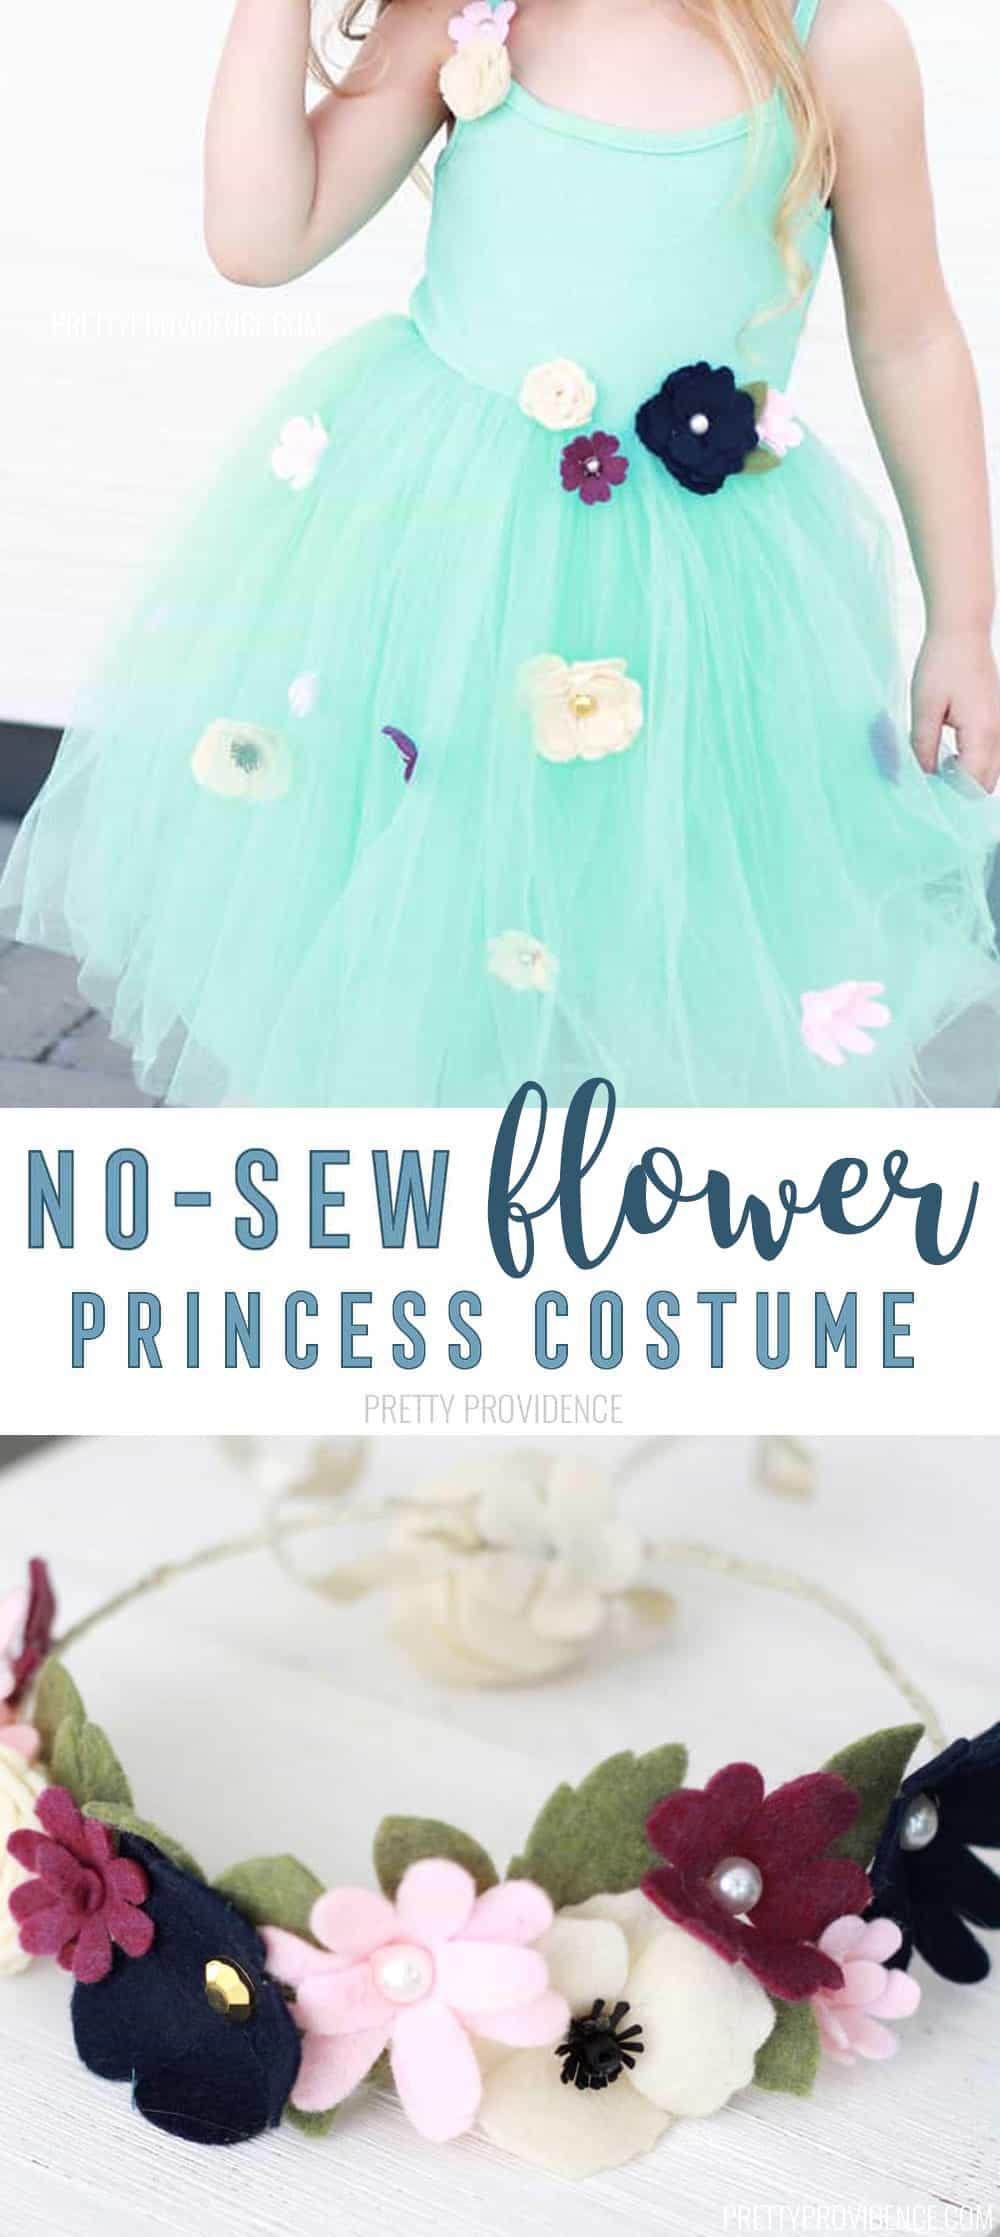 DIY Flower Princess Costume! No Sew Princess Costumes for Halloween or Princess Camp!